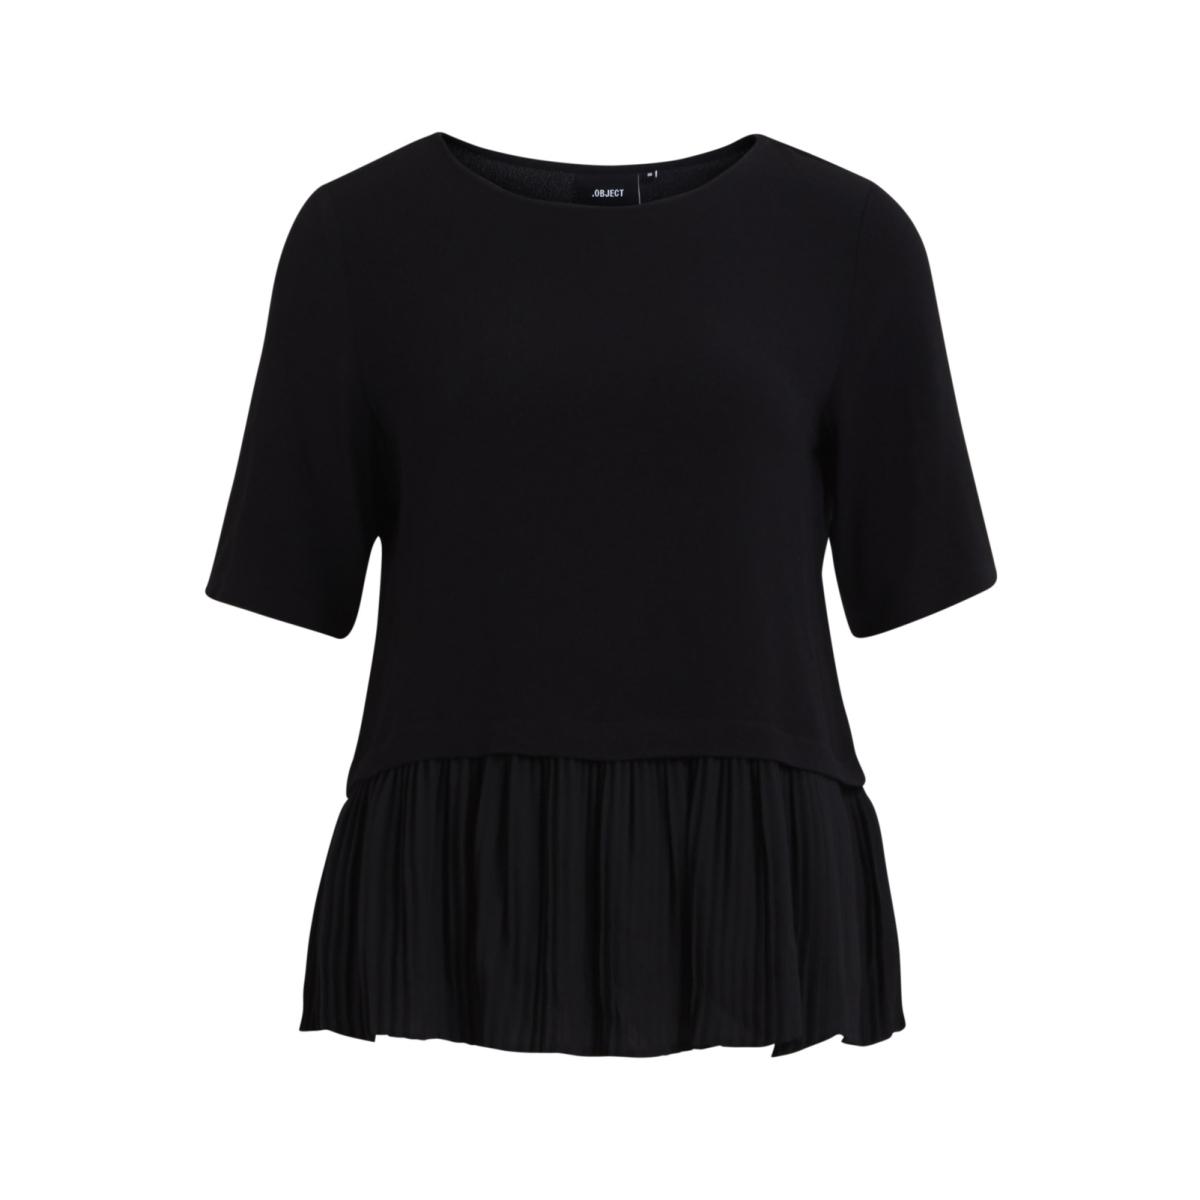 objsofy 3/4 top 93 23025176 object blouse black